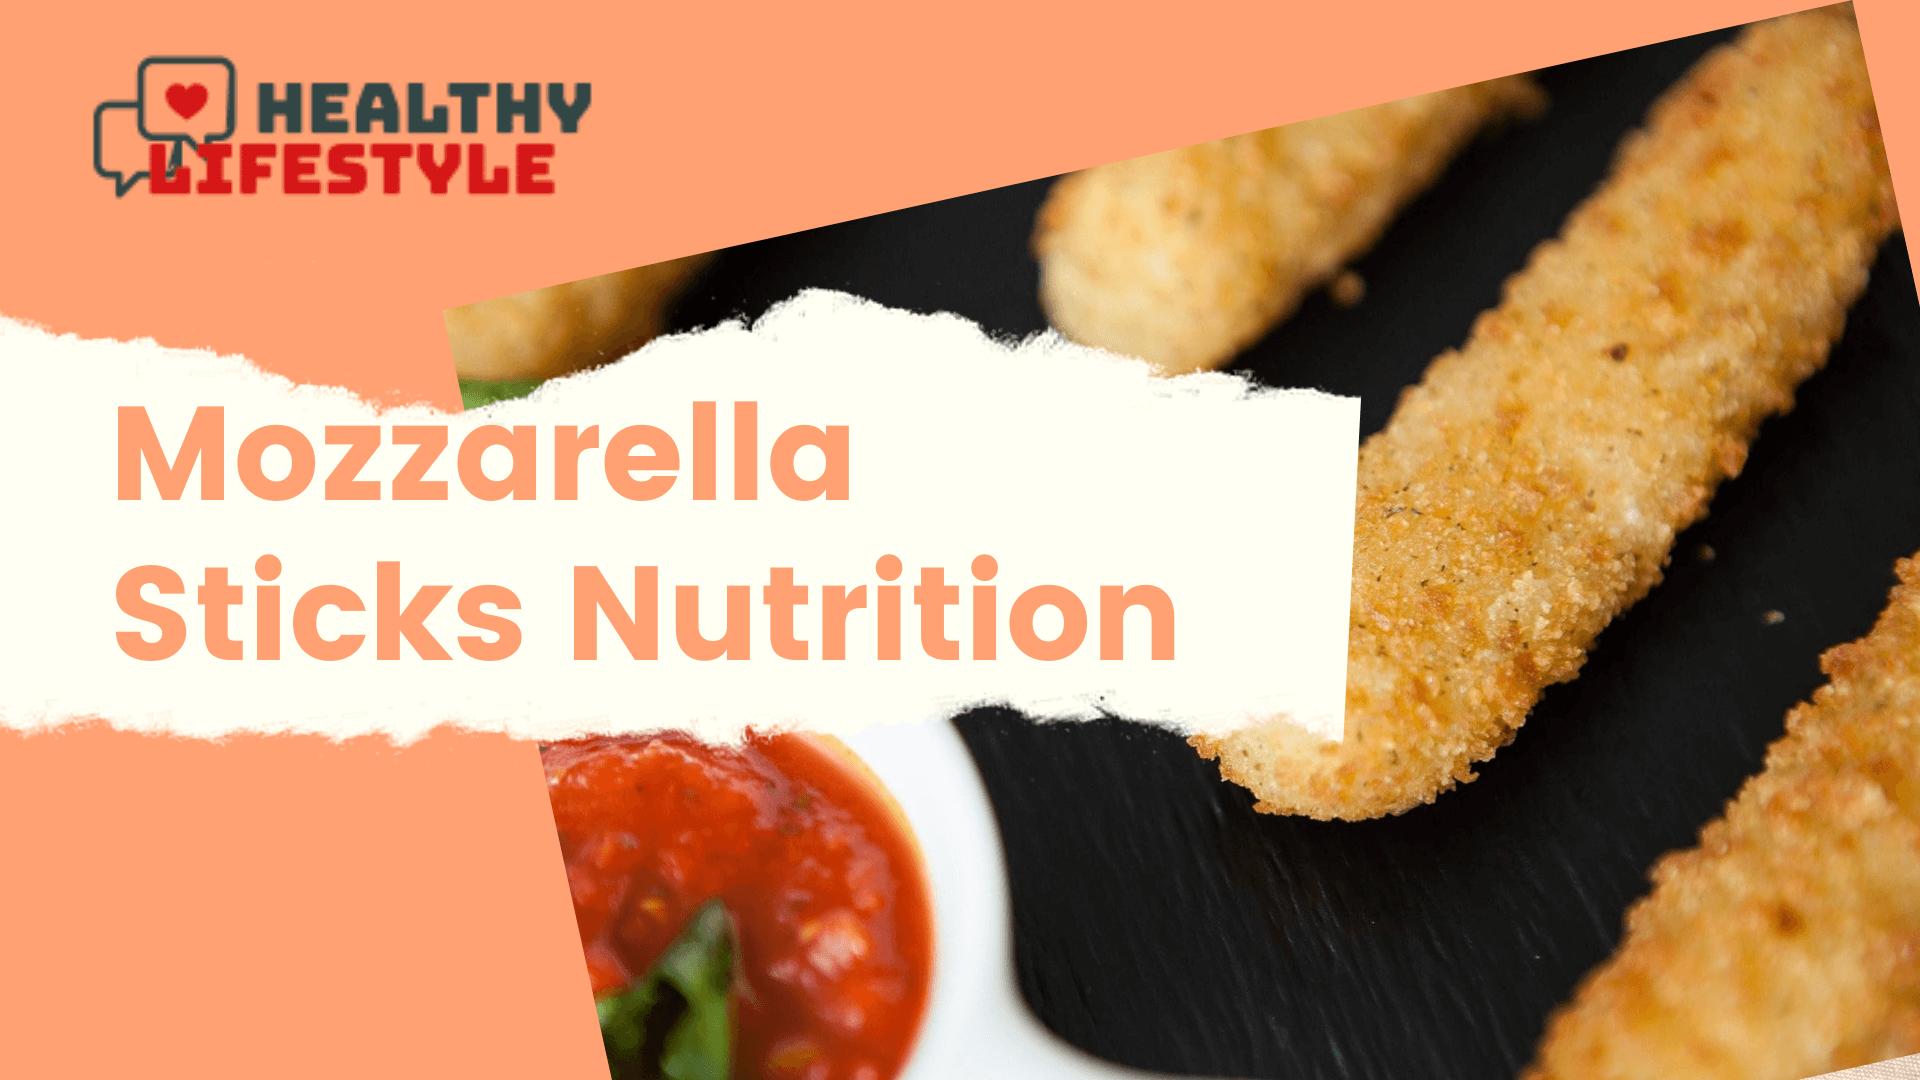 mozzarella sticks nutrition